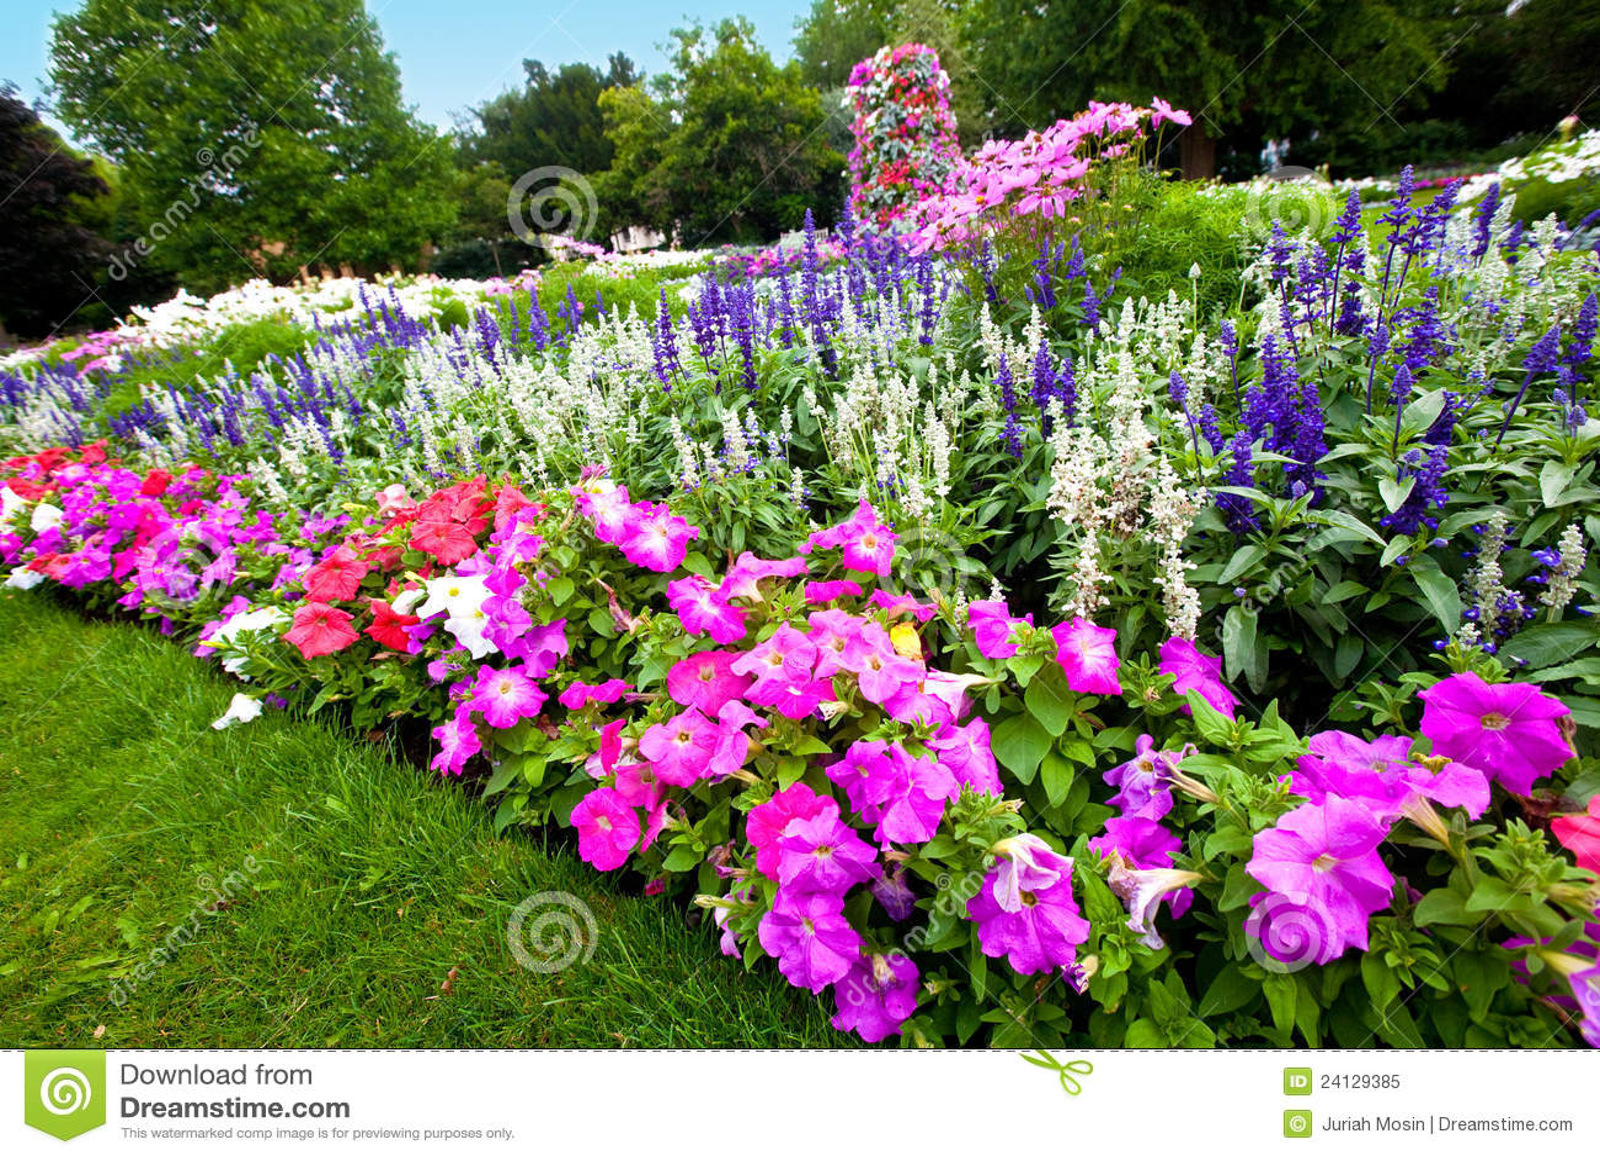 flores coloridas jardim:Azalea Flower Garden